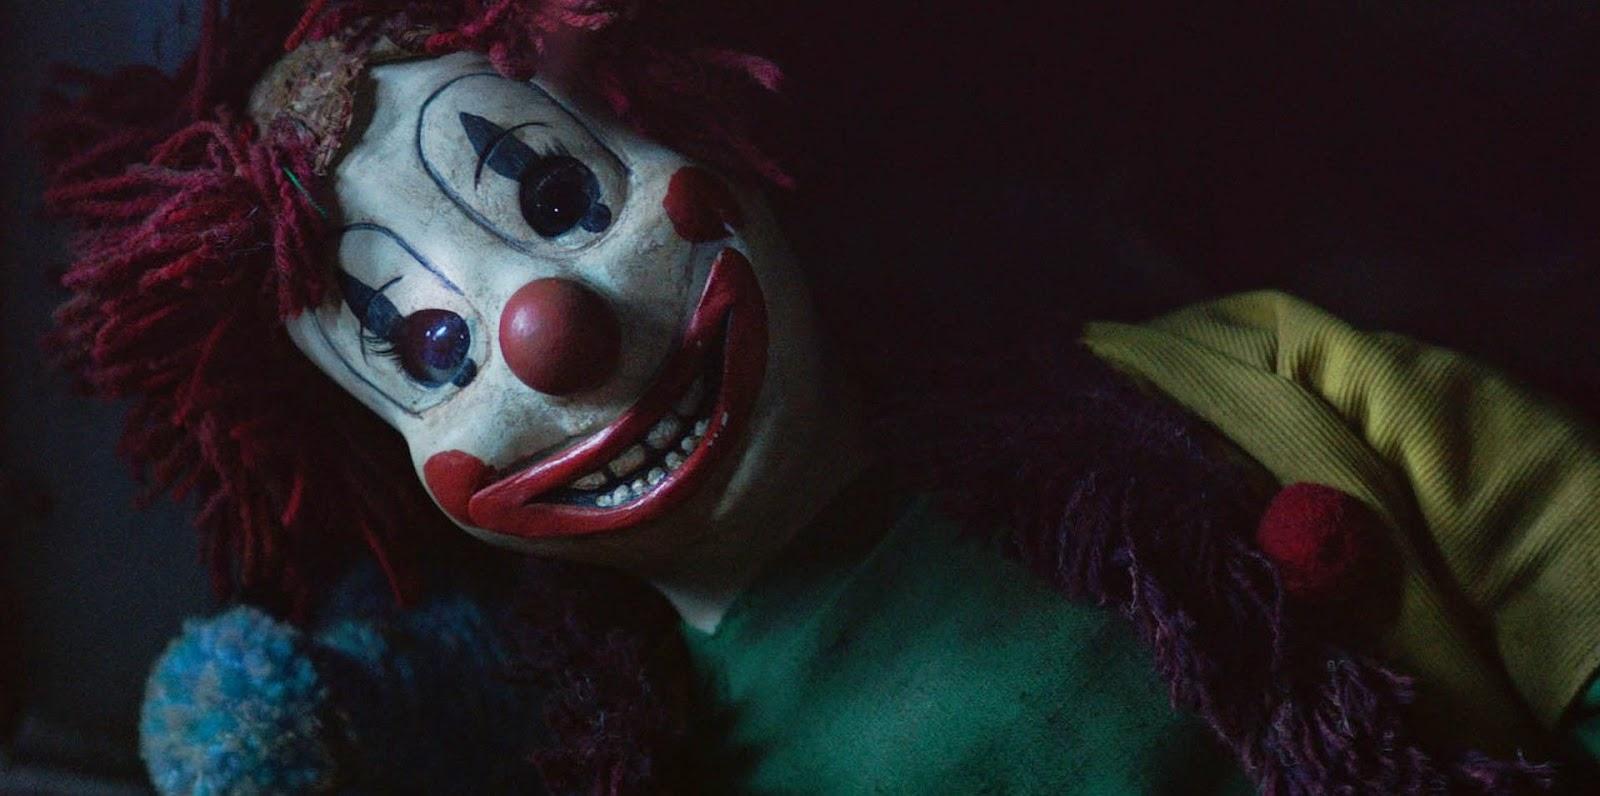 Cenas inéditas no featurette do terror sobrenatural Poltergeist: O Fenômeno